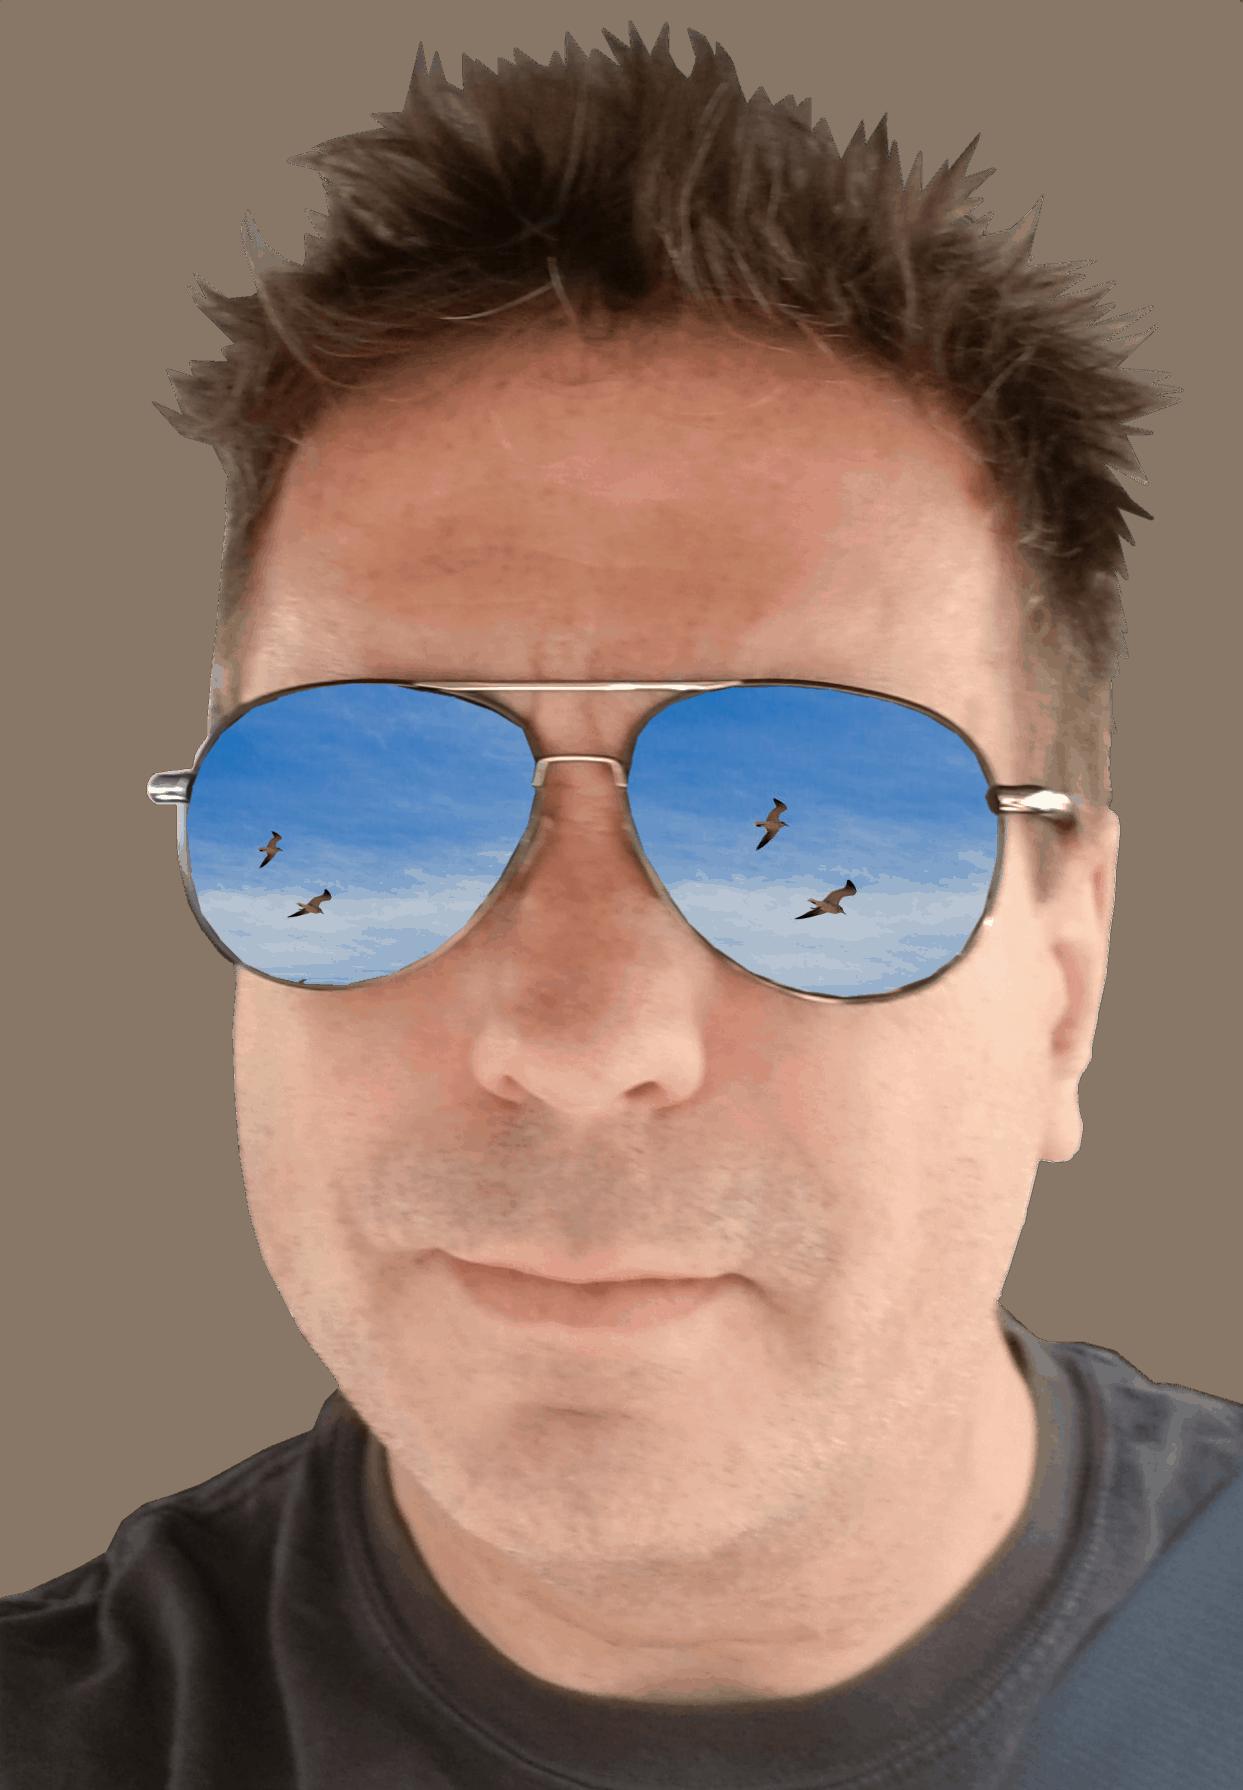 Mike Haynes - Founder of iSatisfy.com